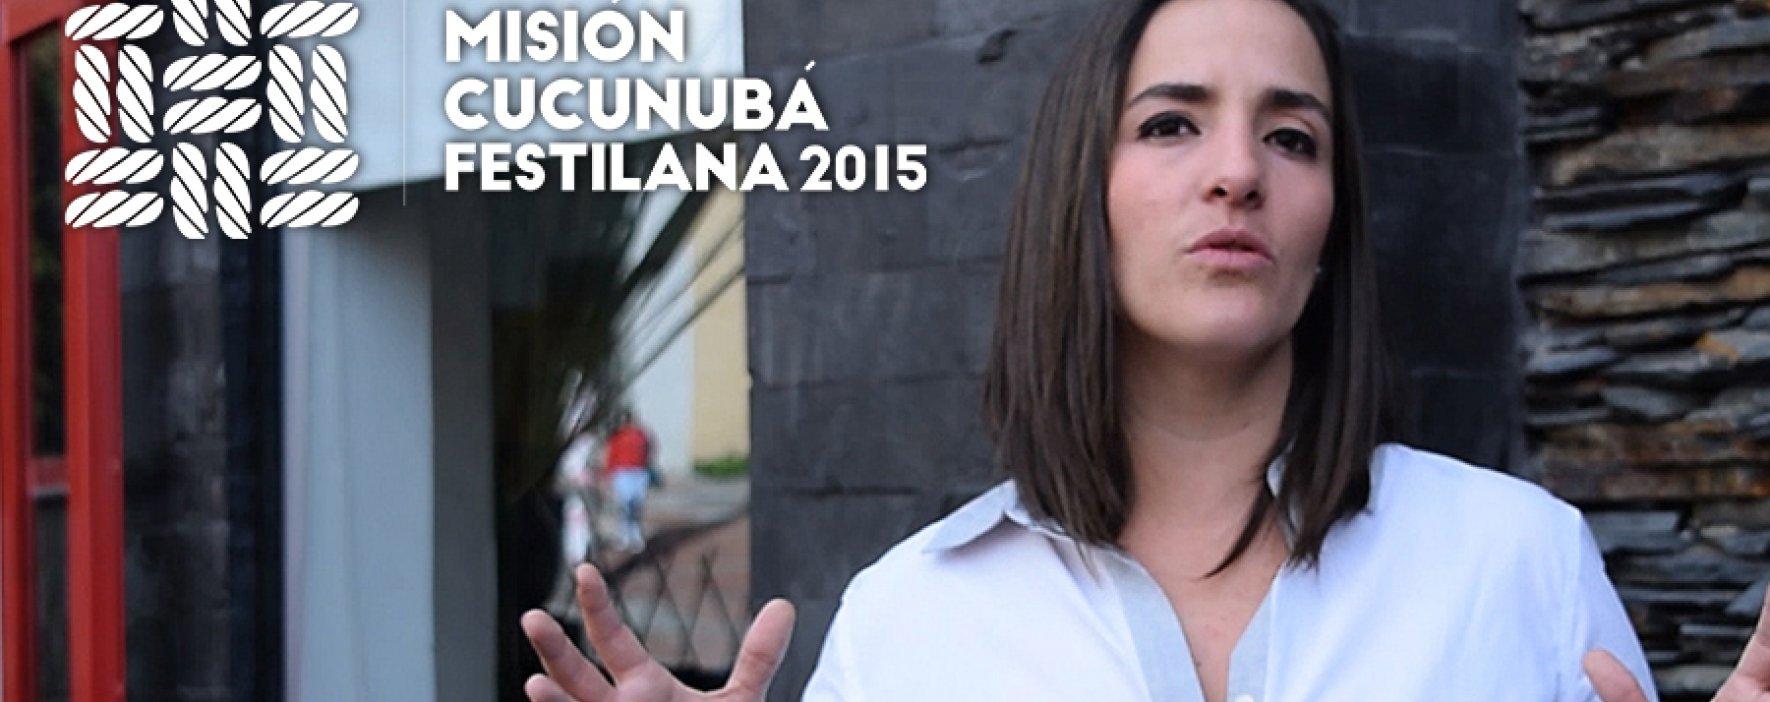 Todos a Festilana, todos por Festilana, Festilana 2015